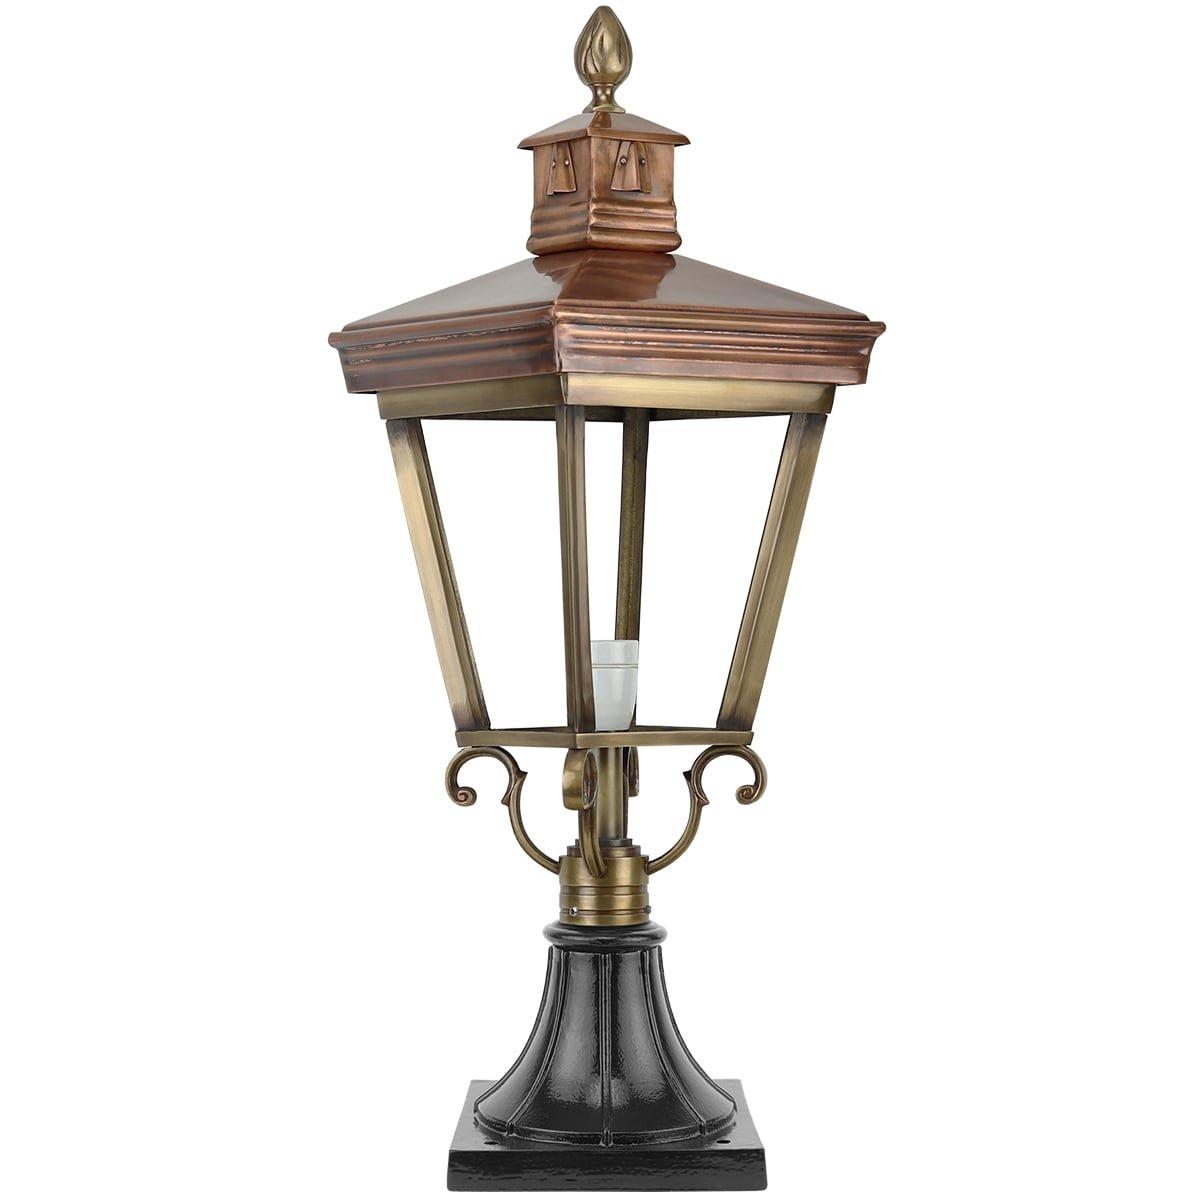 Outdoor Lighting Classic Nostalgic Yard lamp Exloërveen bronze - 75 cm